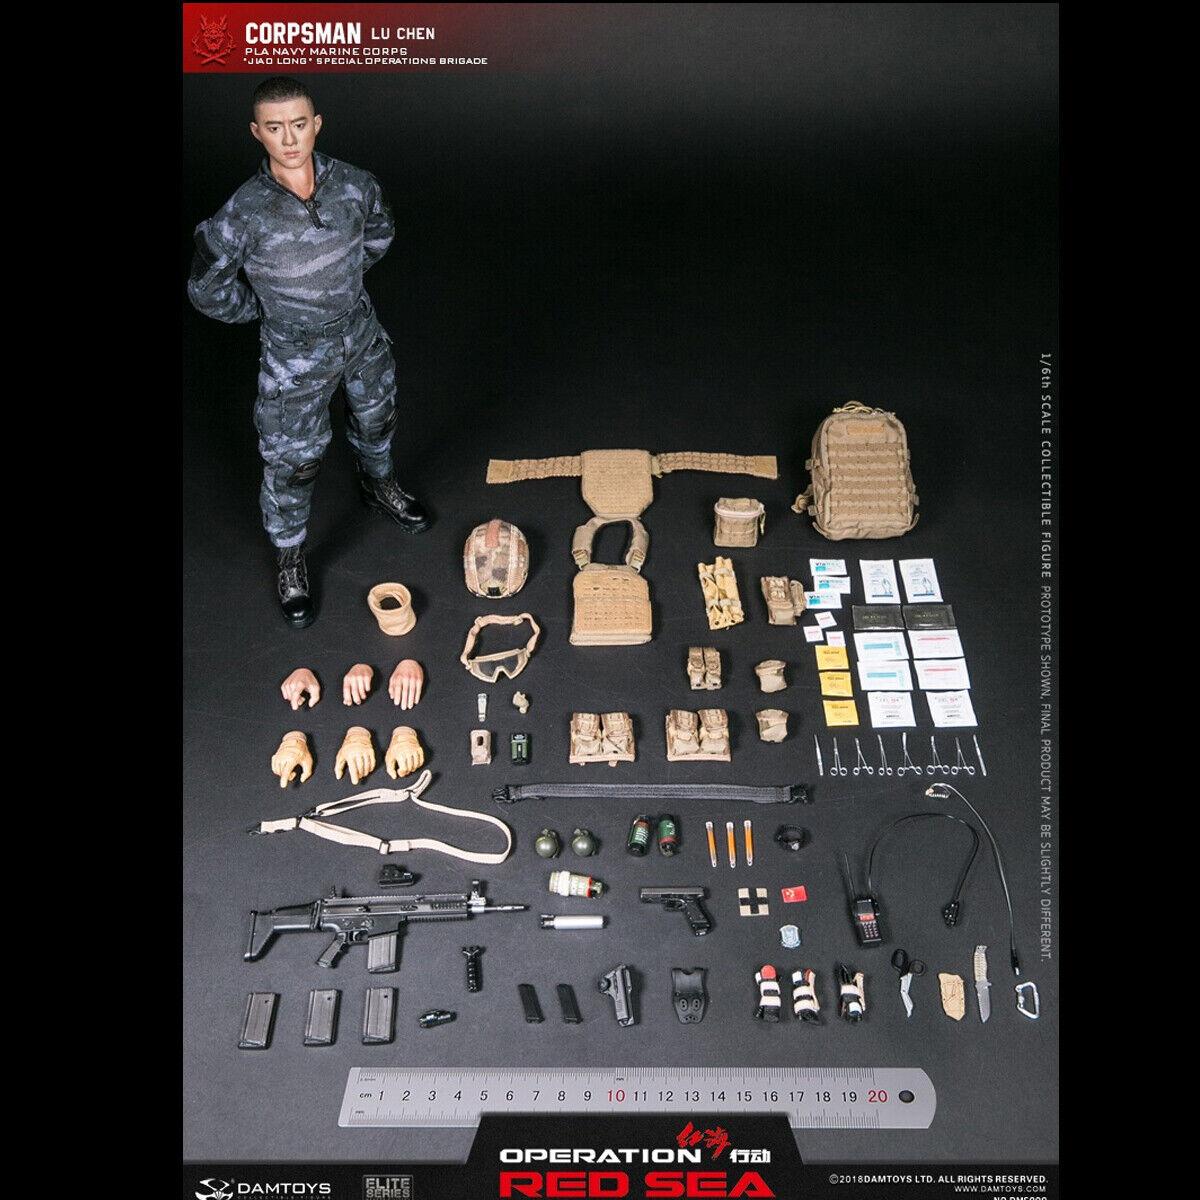 DAMTOYS 1 6 Operation rot Sea PLA Navy Marine Corps Coprsman Lu Chen DMS009 Doll